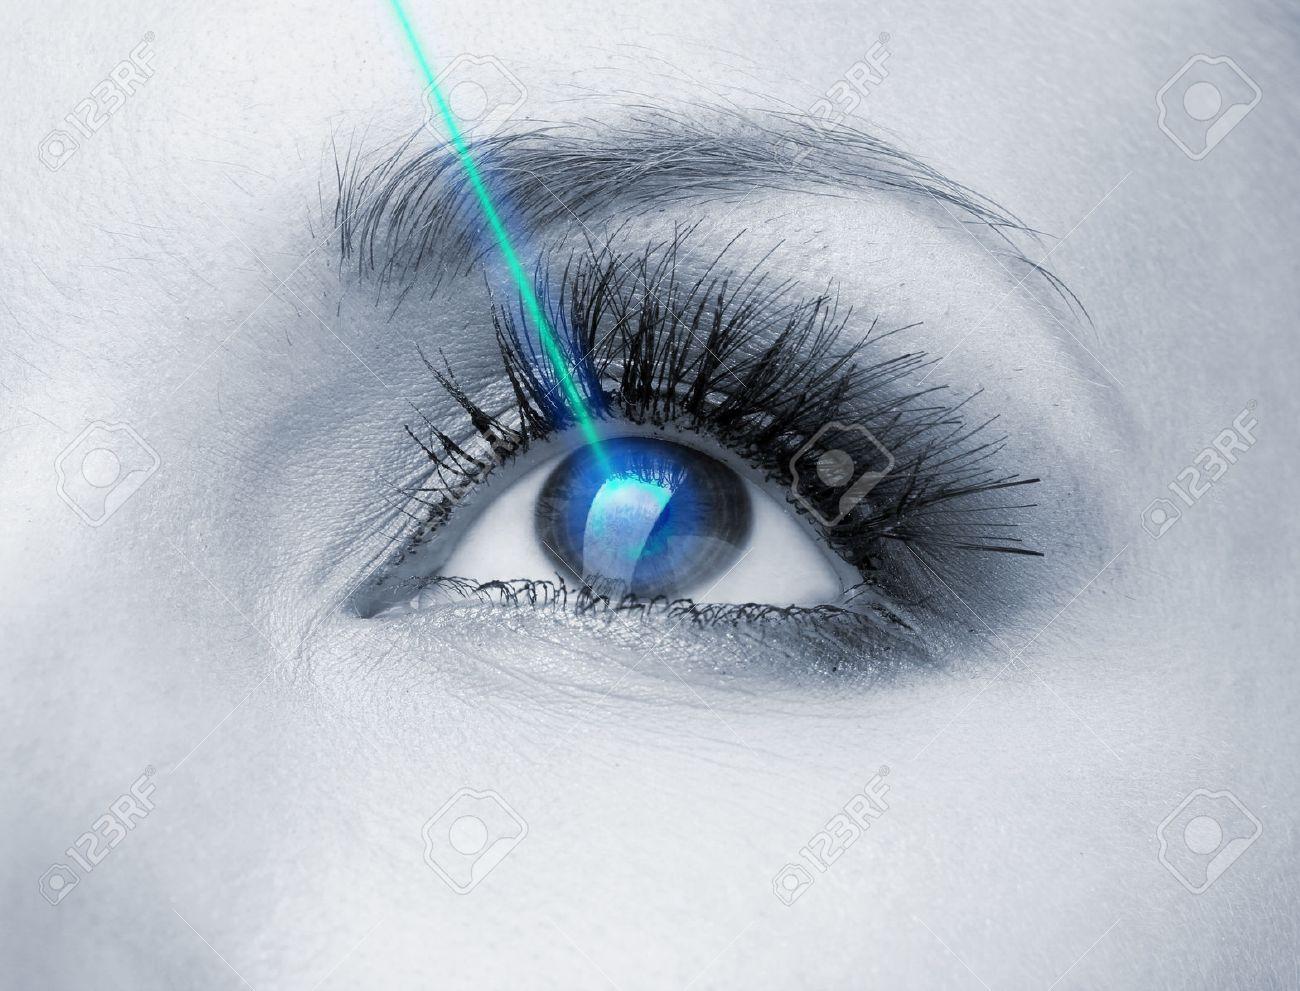 Laser vision correction. Woman's eye. - 27096217